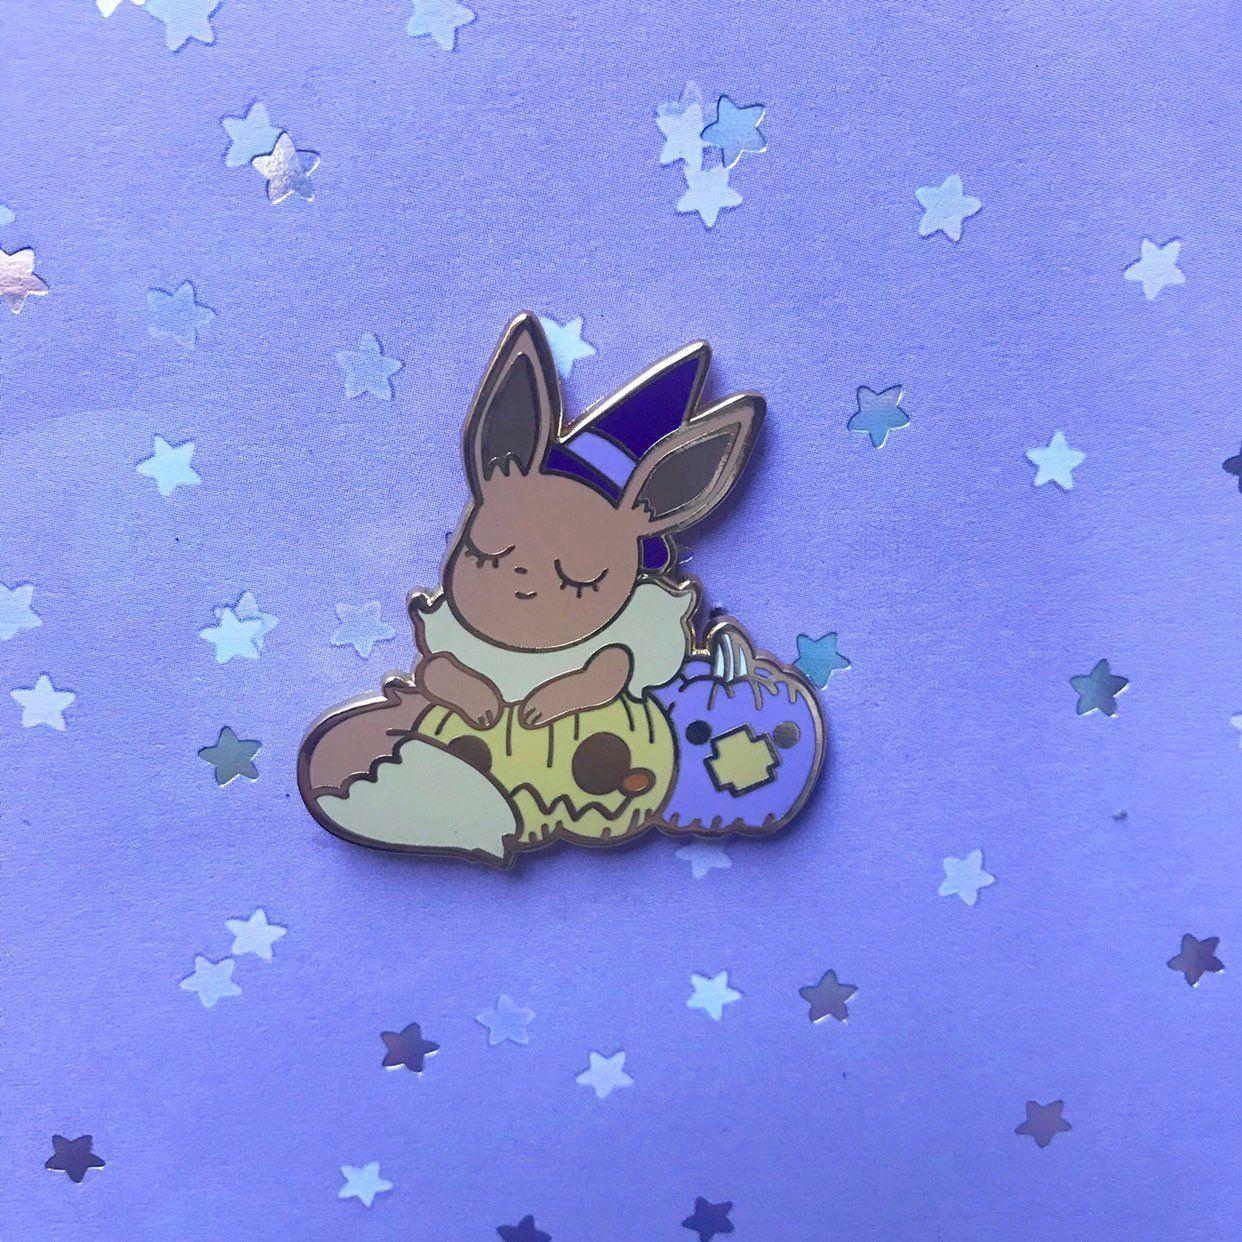 Witch Pokemon Pins made by Veestoria -